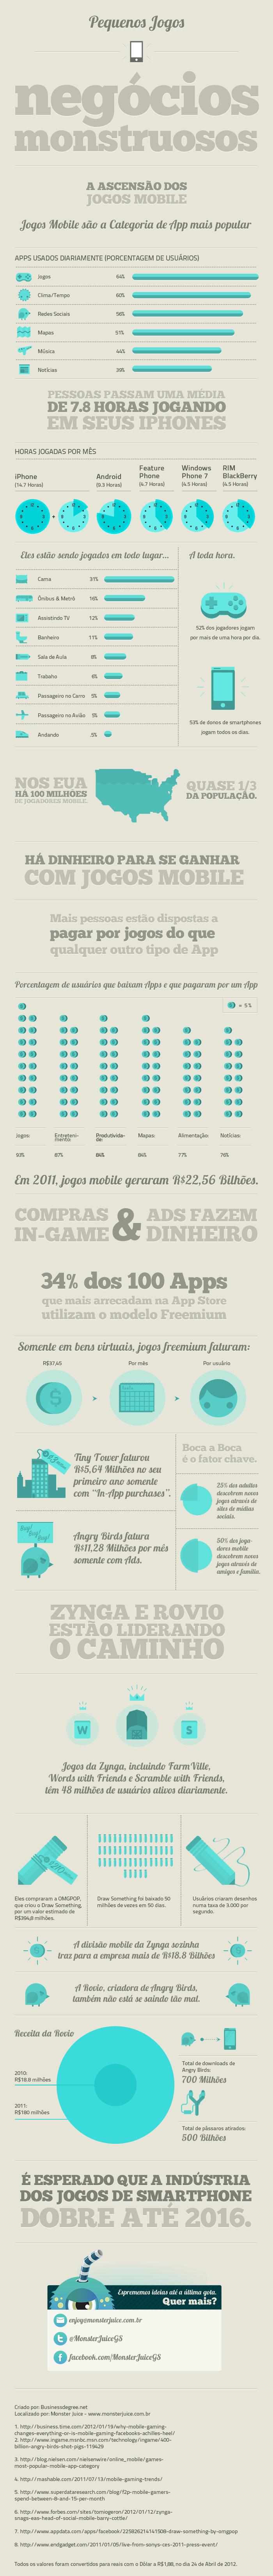 Infográfico de jogos mobile